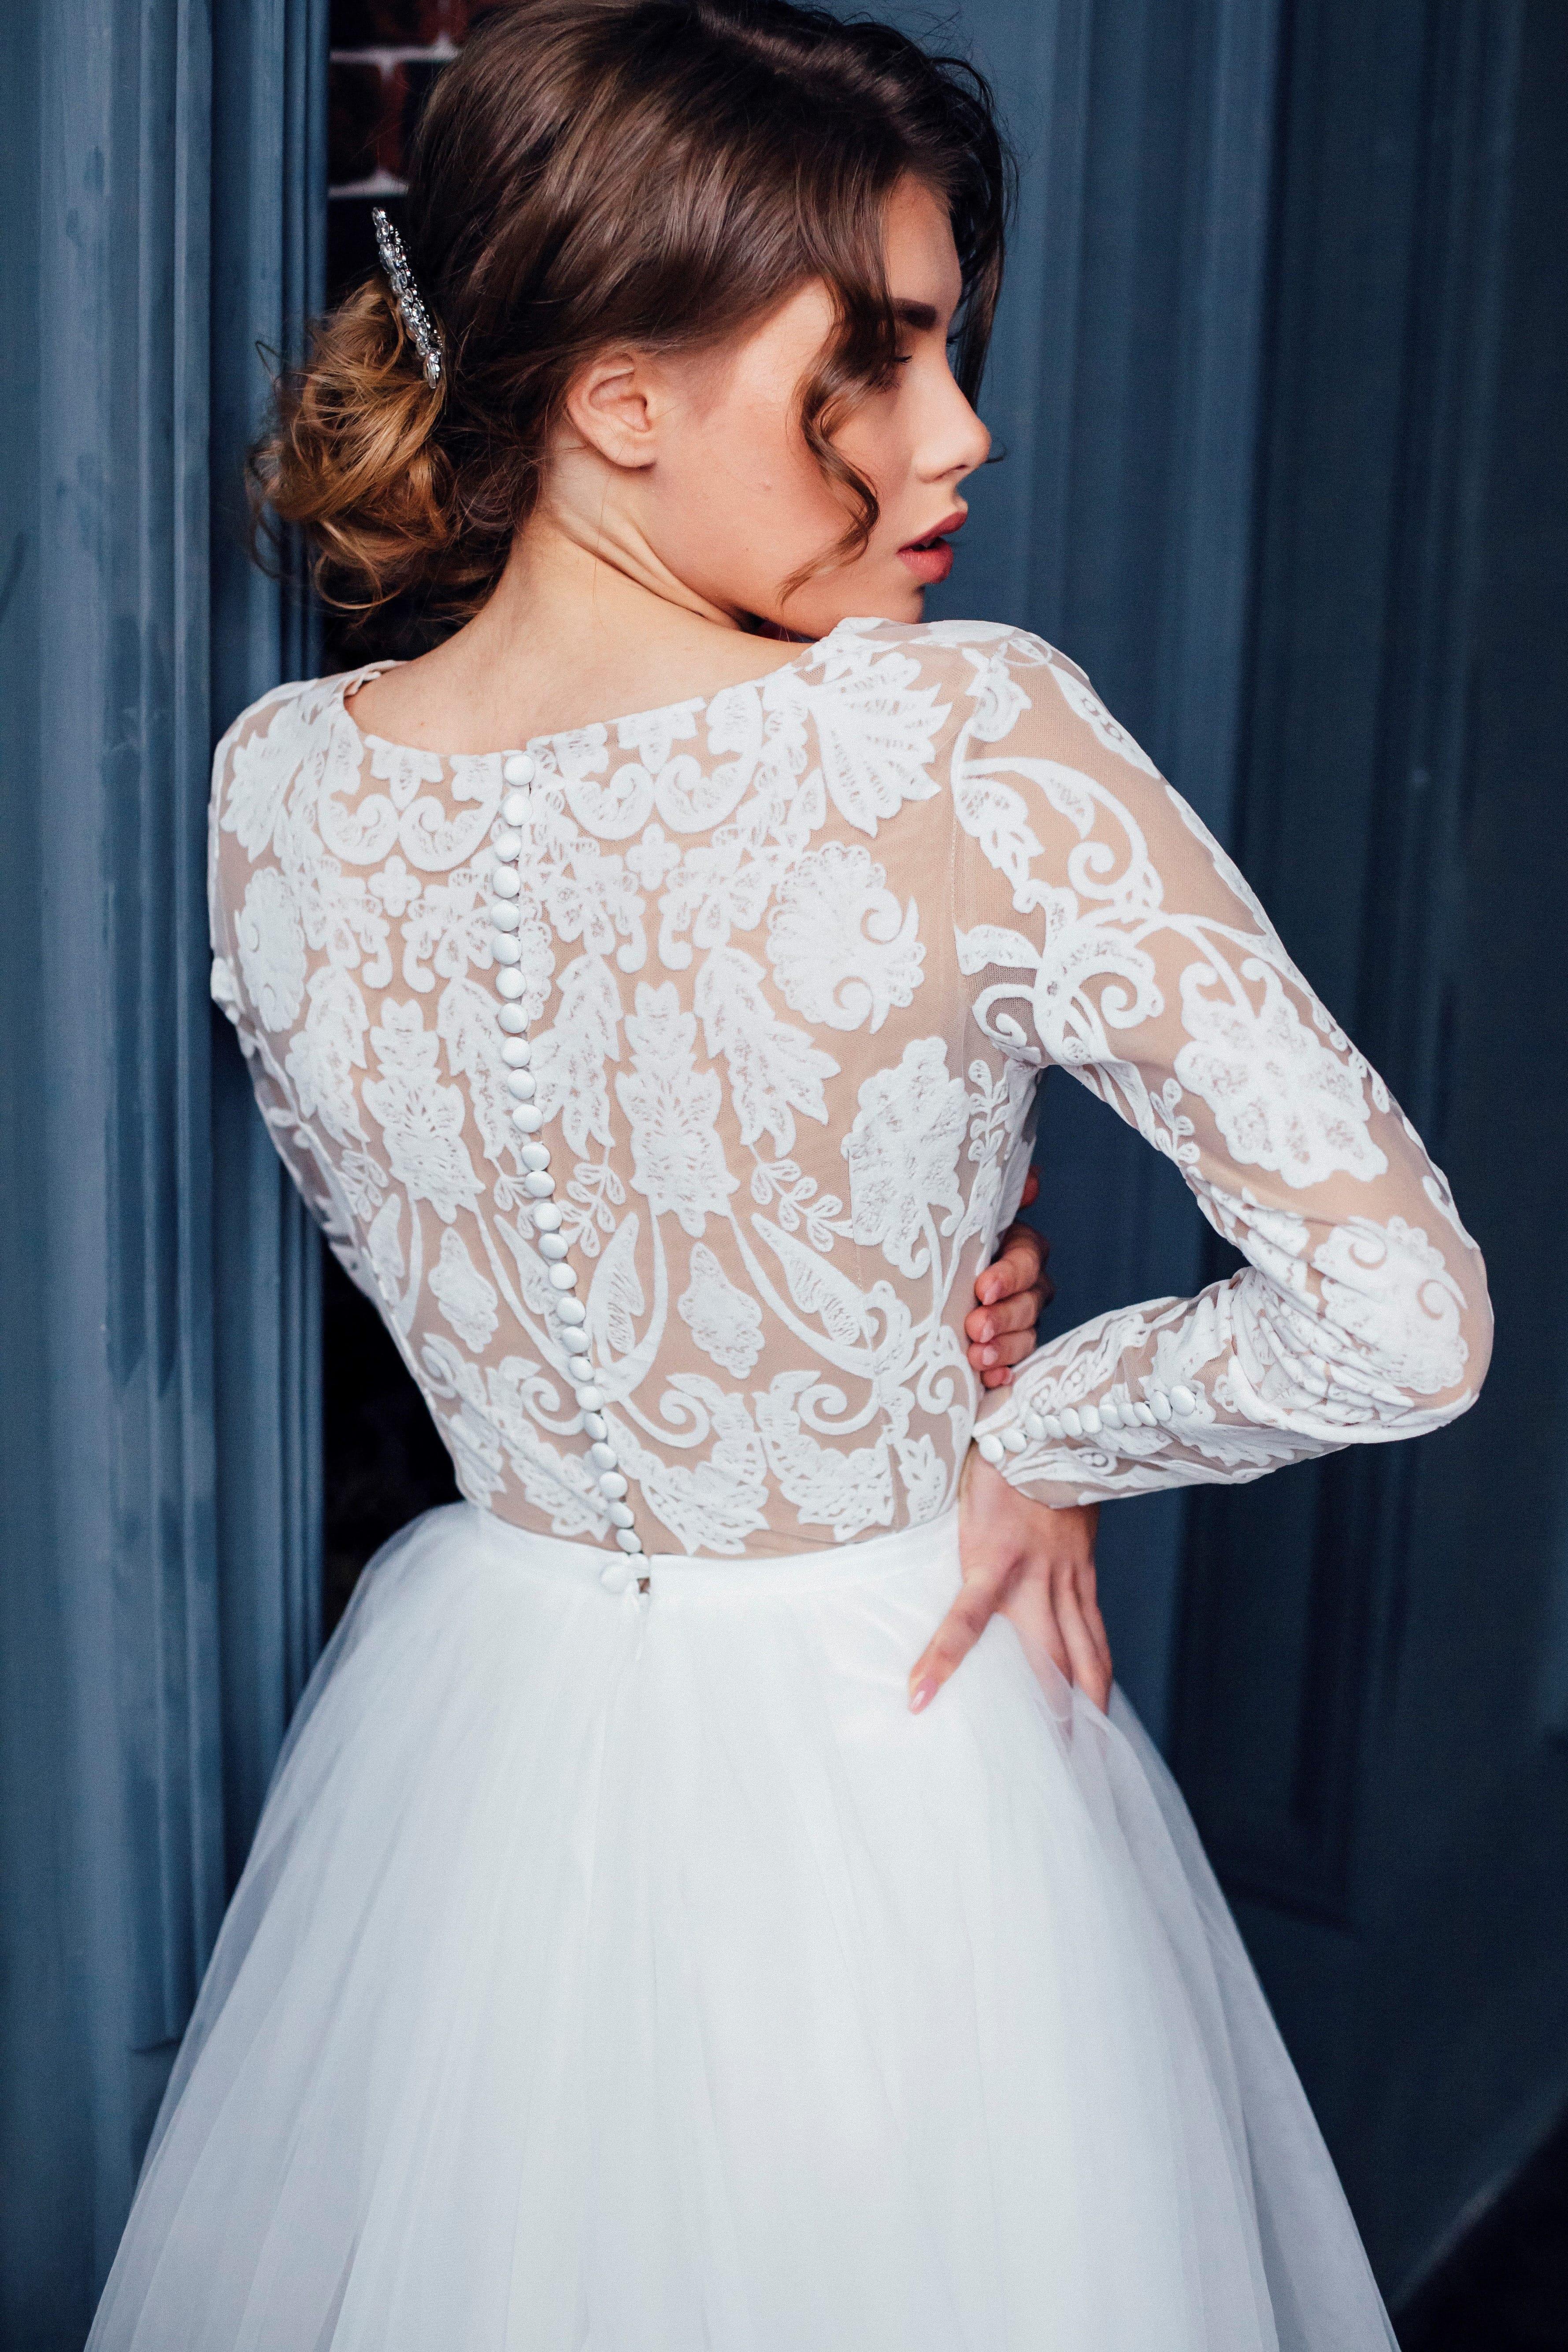 Свадебное платье MARGARET, коллекция THE ABSOLUTE LOVE, бренд RARE BRIDAL, фото 4